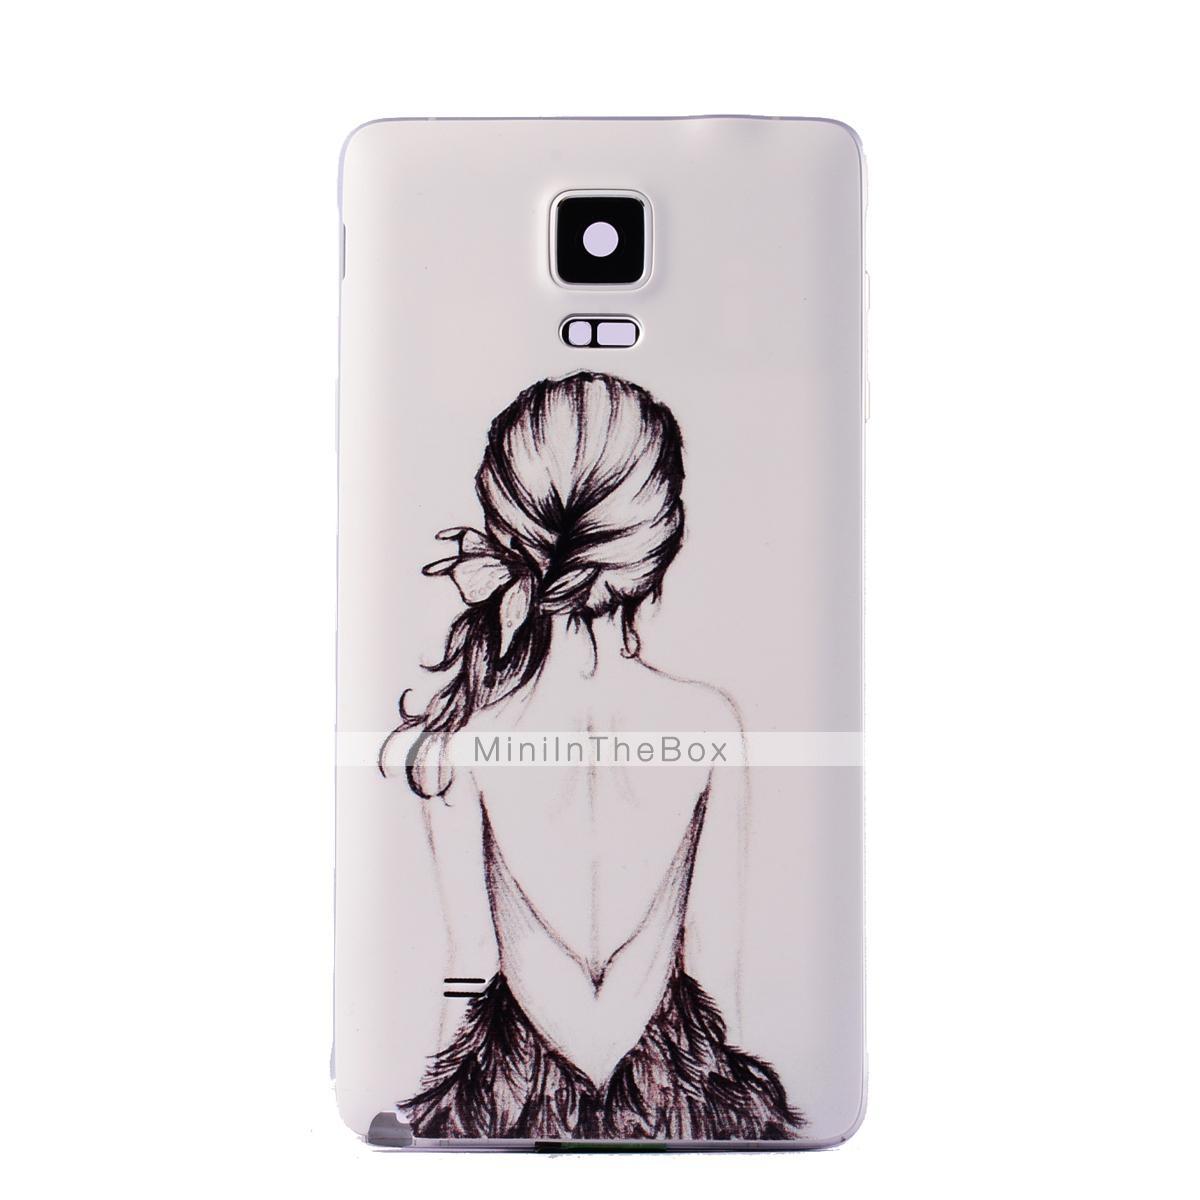 Рисунки на чехол для телефона своими руками